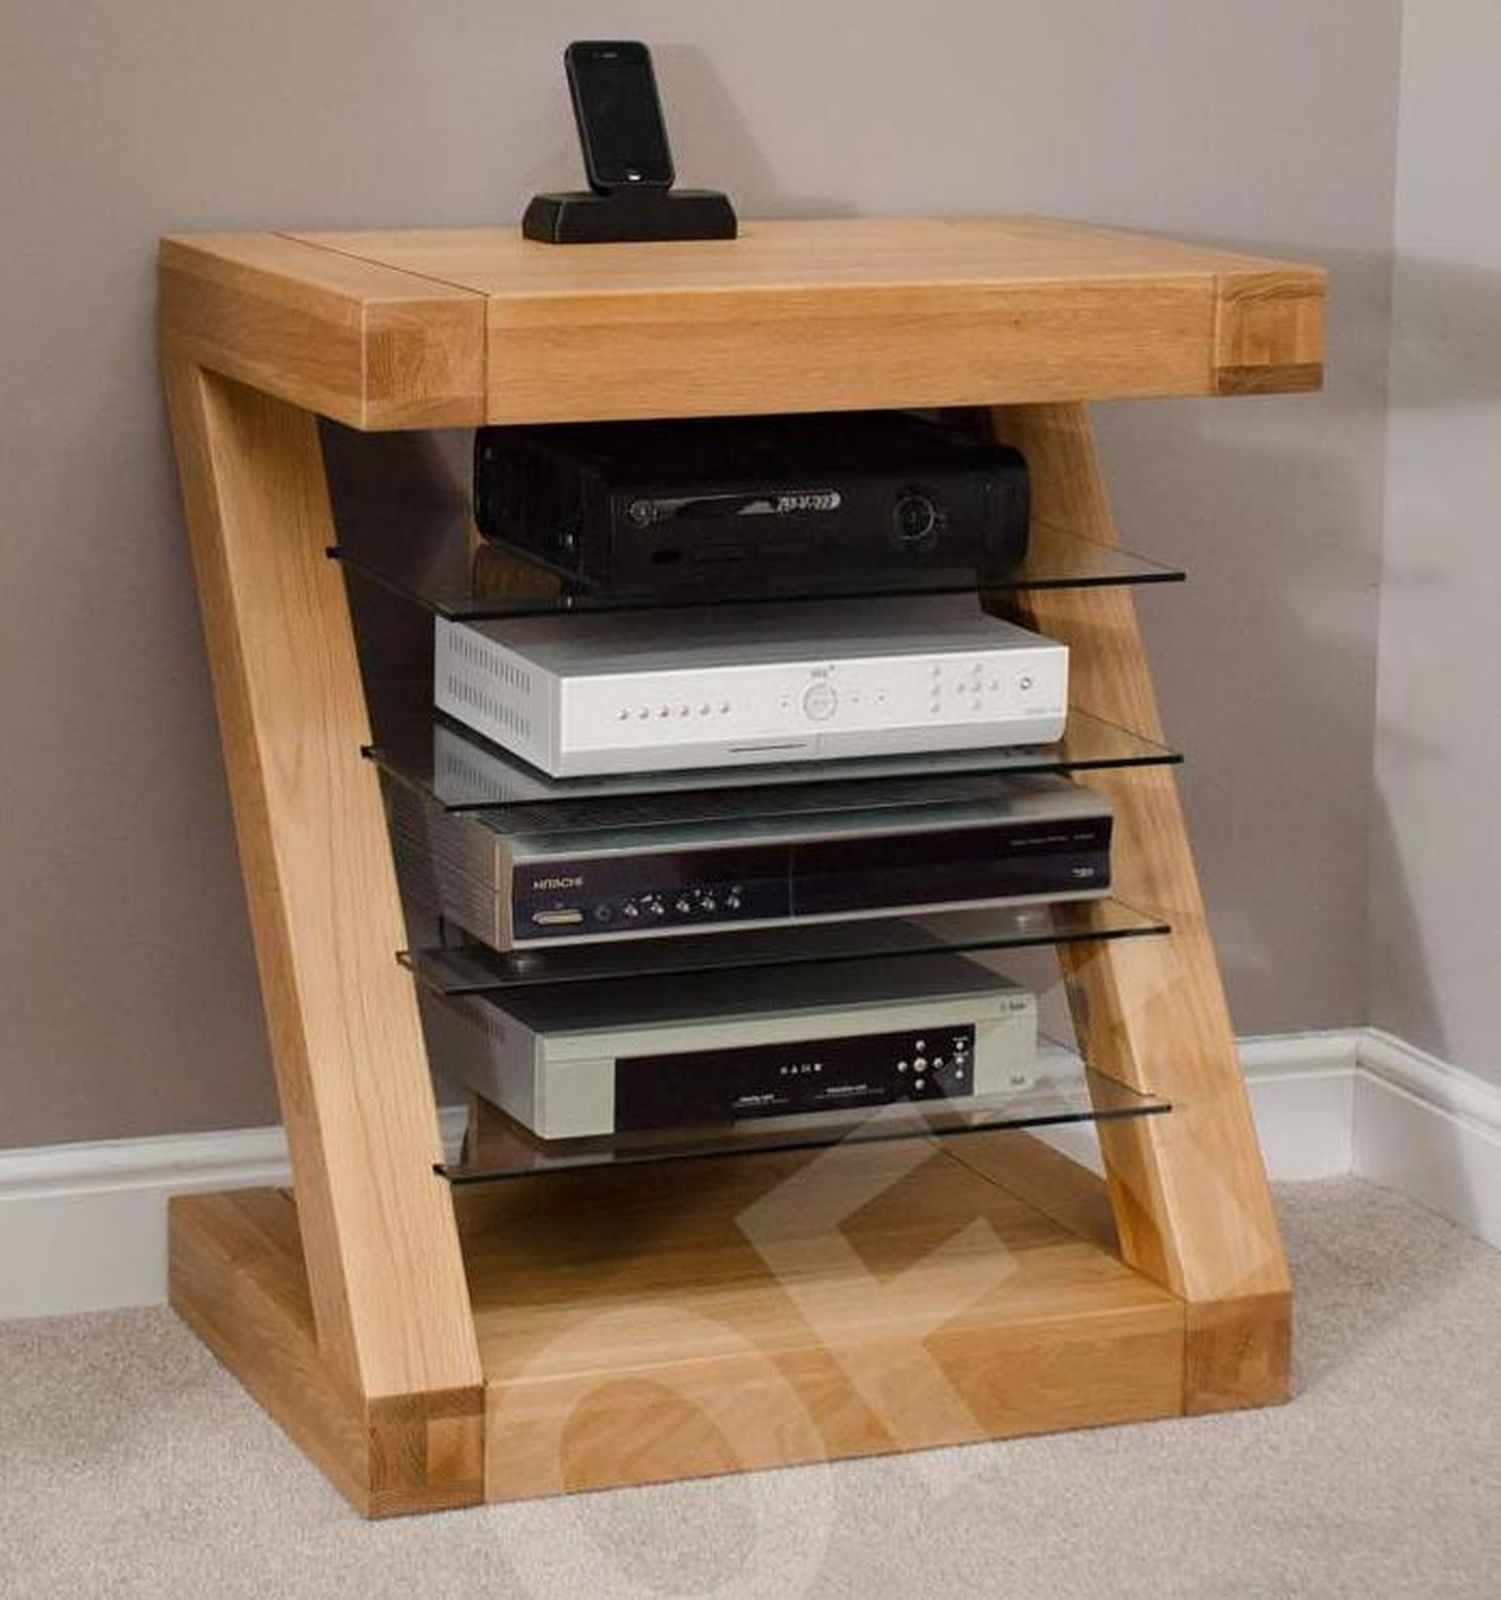 Muebles Hifi Barcelona - Z Hi Fi Cabinet Dvd Console 4 Shelf Storage Unit Solid Oak [mjhdah]http://www.comoficho.com/oc-content/uploads/76/24639.jpg